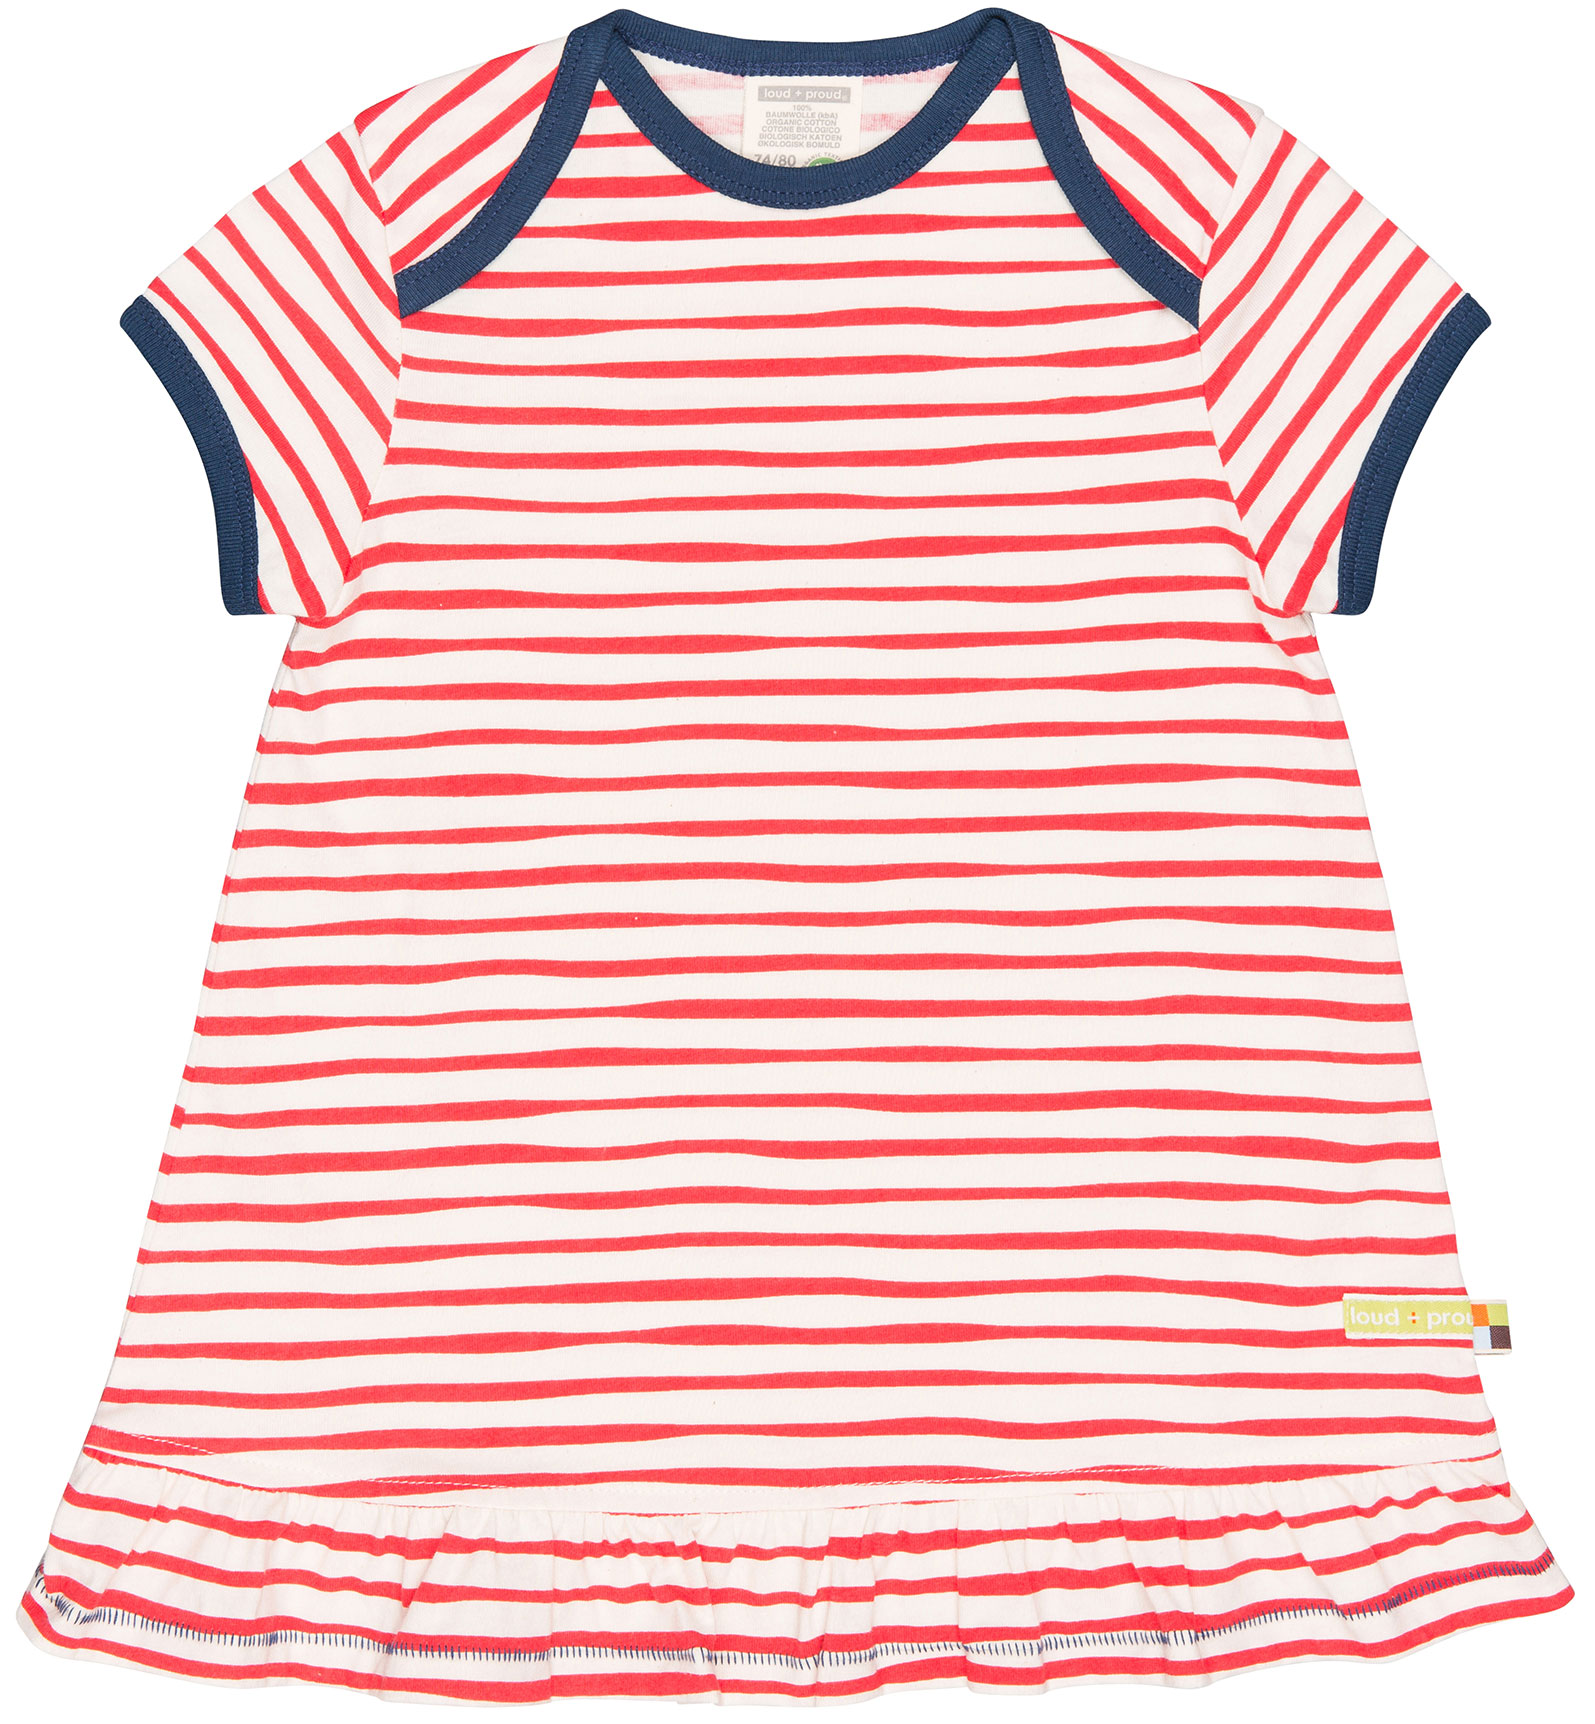 Loud+Proud Kurzarm Kleid weiß-rot gestreift | Kurzarm ...